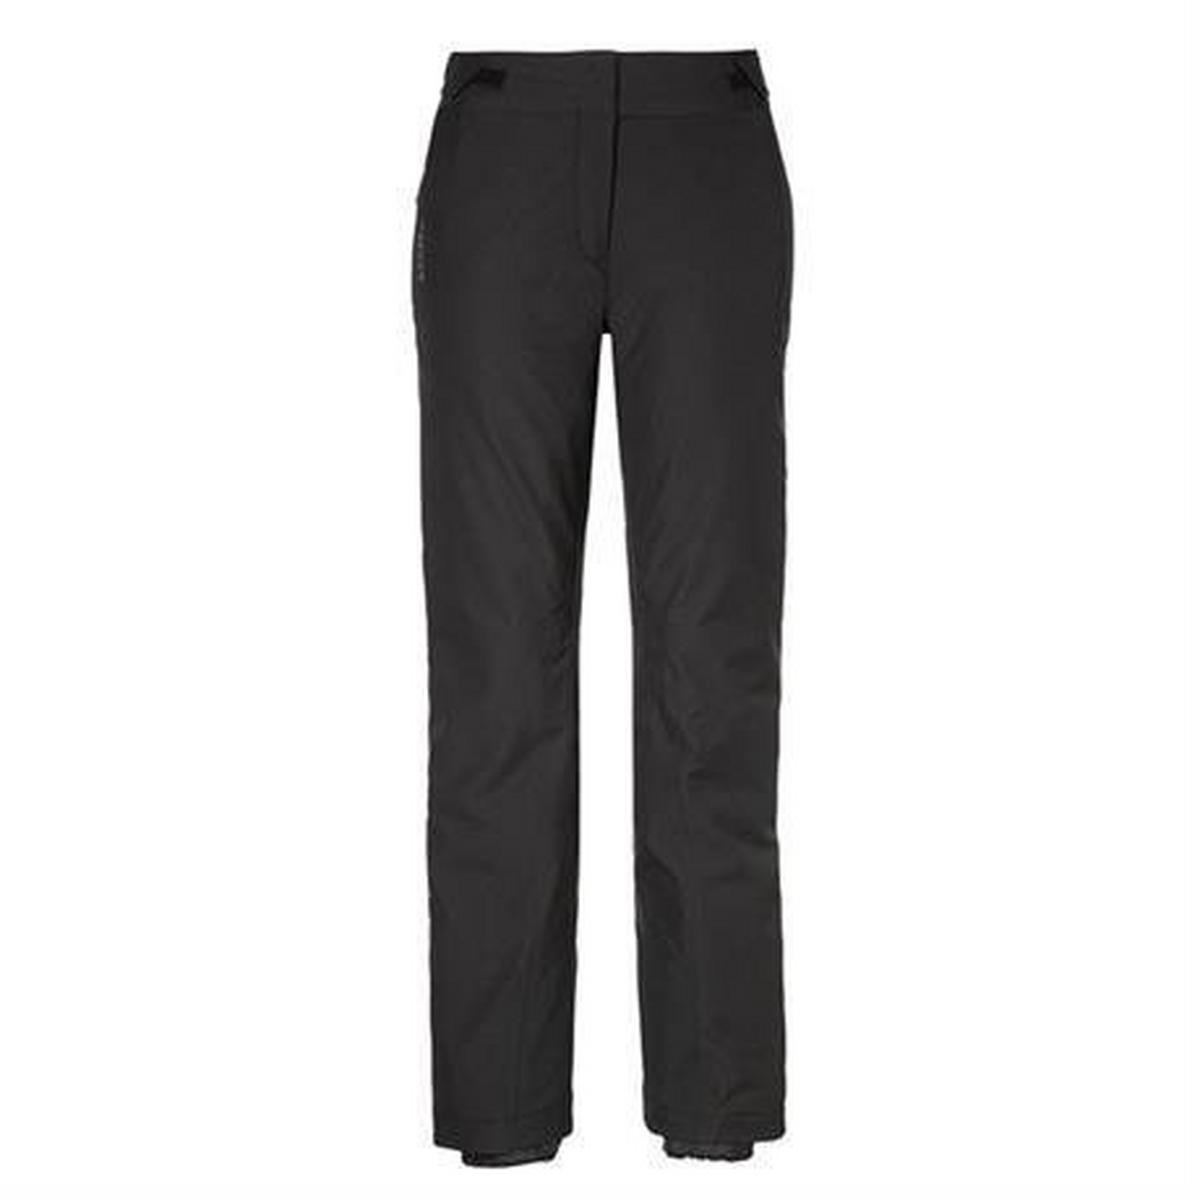 Schoffel SKI Pants Women's Pinzgau REGULAR Leg Trousers Black